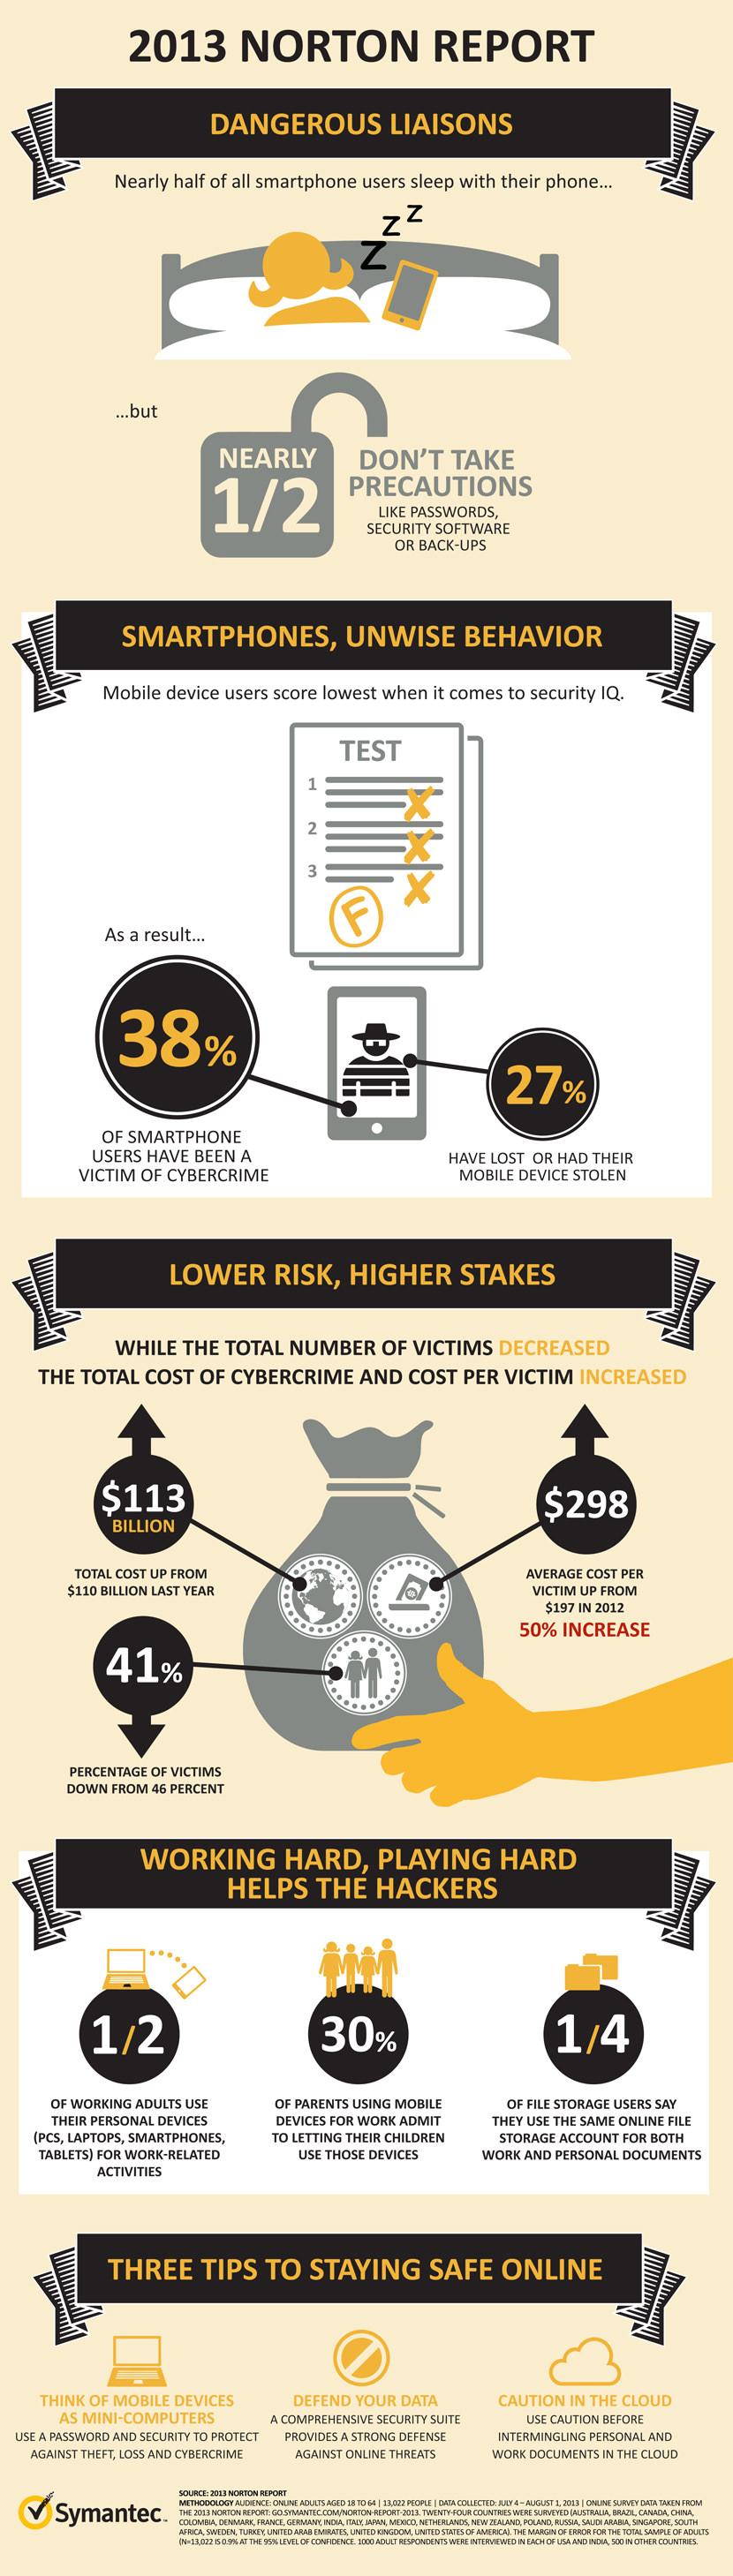 Norton Mobile Security Norton infographic 2013_FINAL